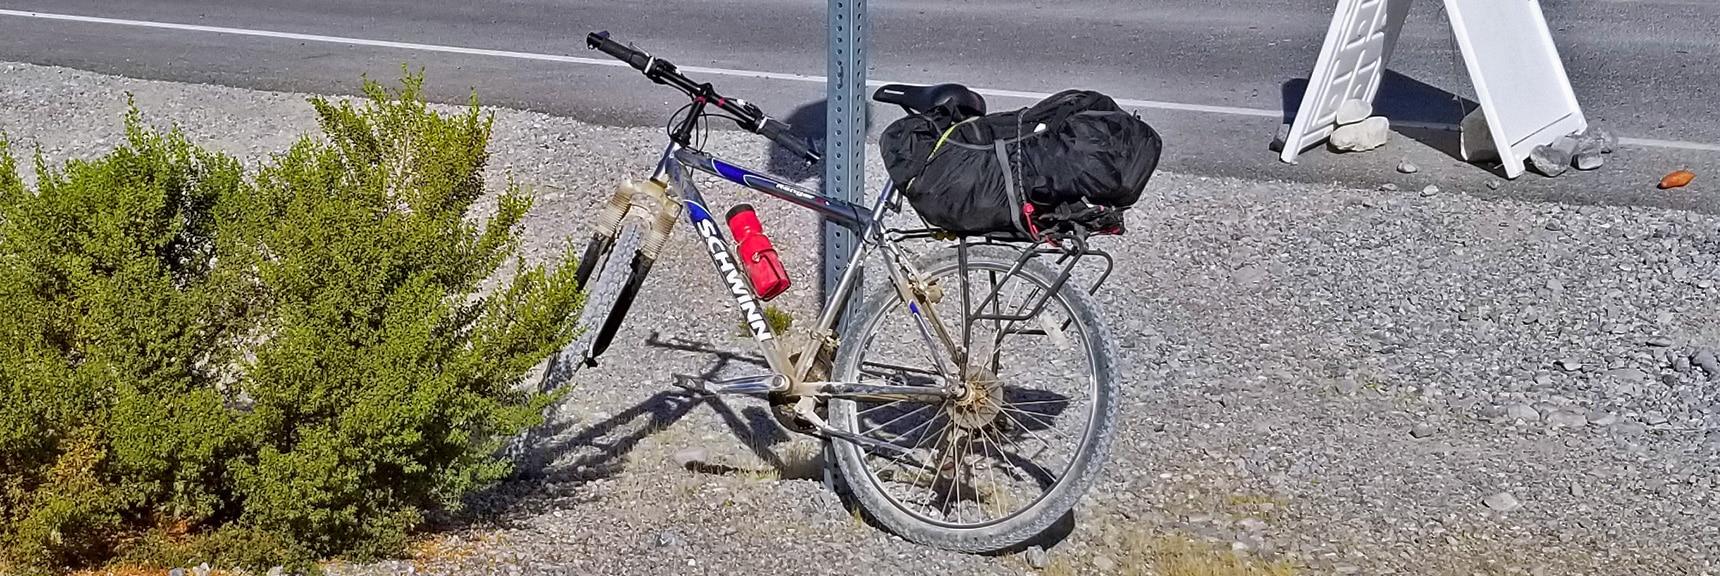 Launching the Sheep Range Adventure! | Smart Car Bike Rack and Mountain Bike Test, Sheep Range, Nevada